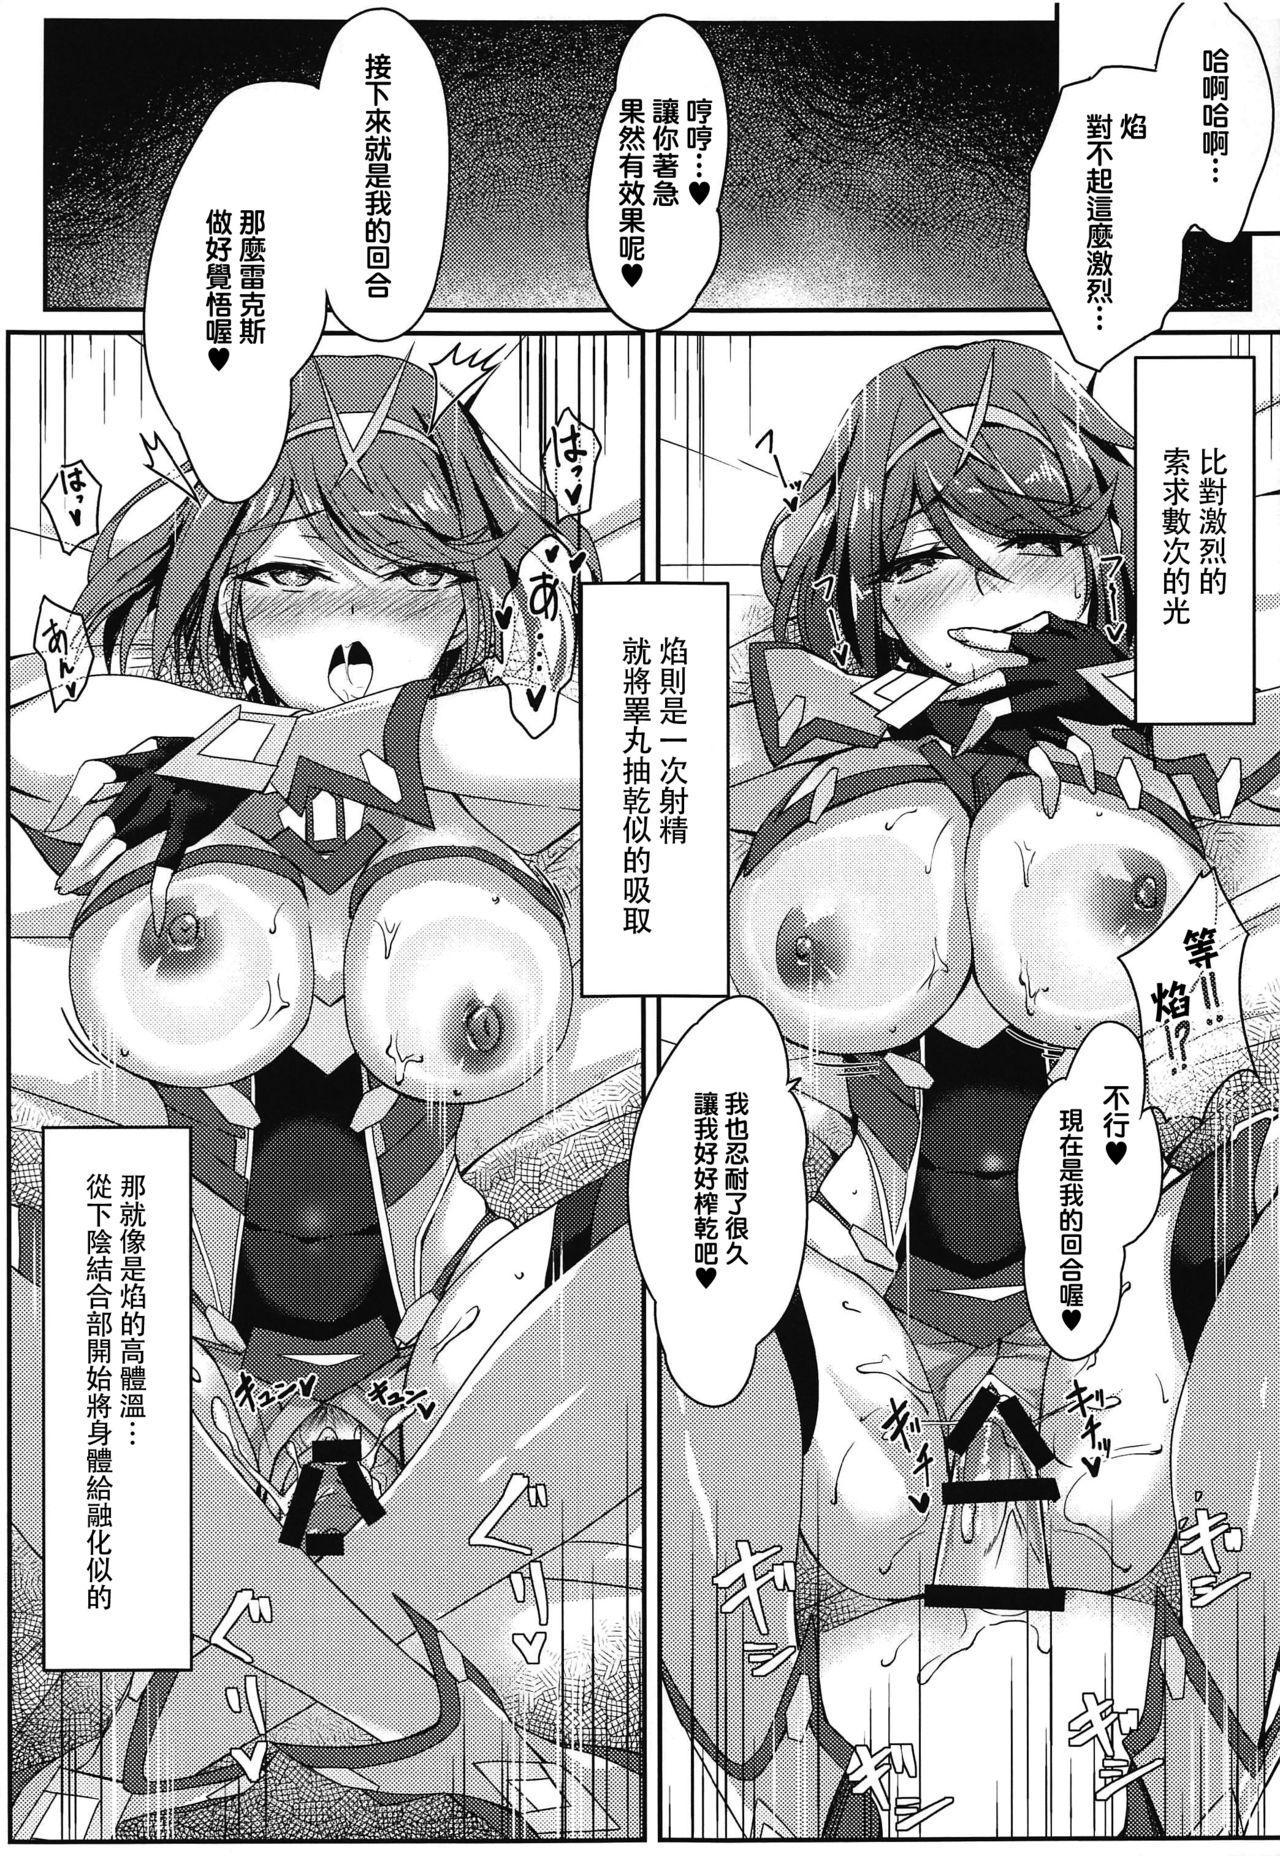 Homura-chan no Ecchi Hon 15